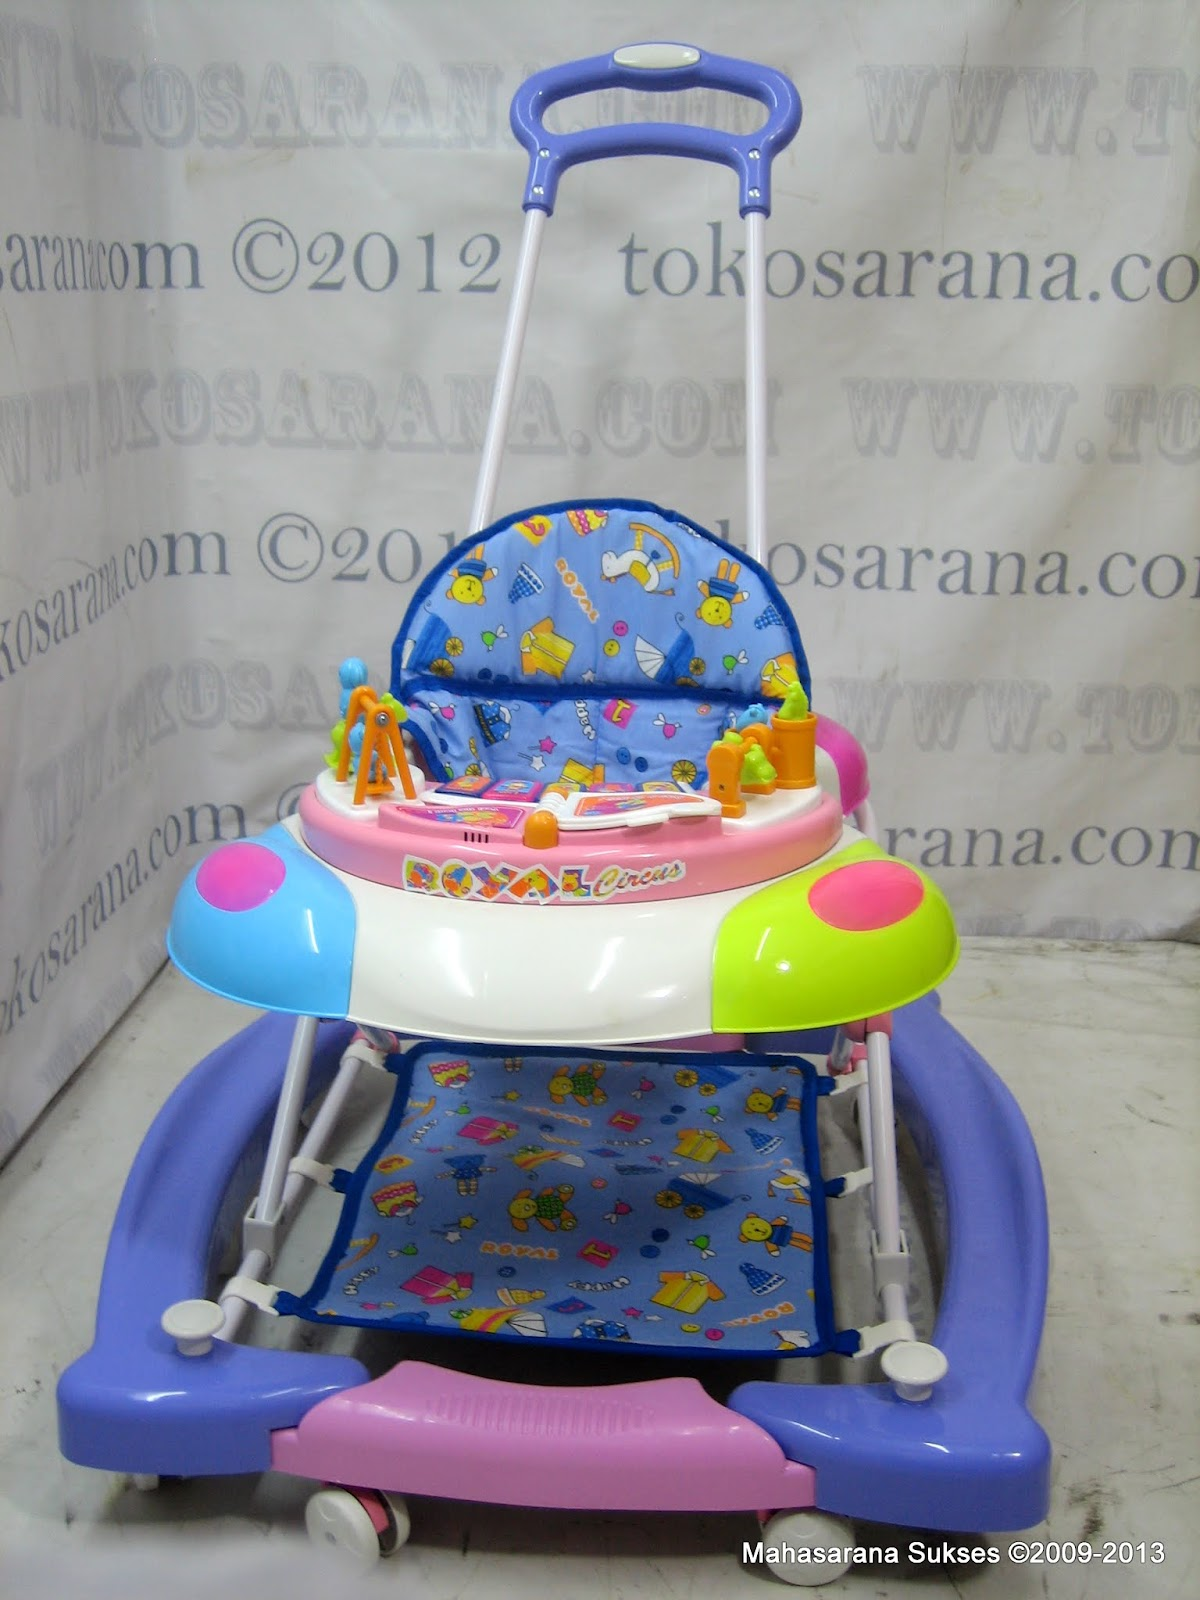 Swing Chair Mudah Bird Knoll Tokosaranajakarta Jatinegara 3 In One Baby Walker